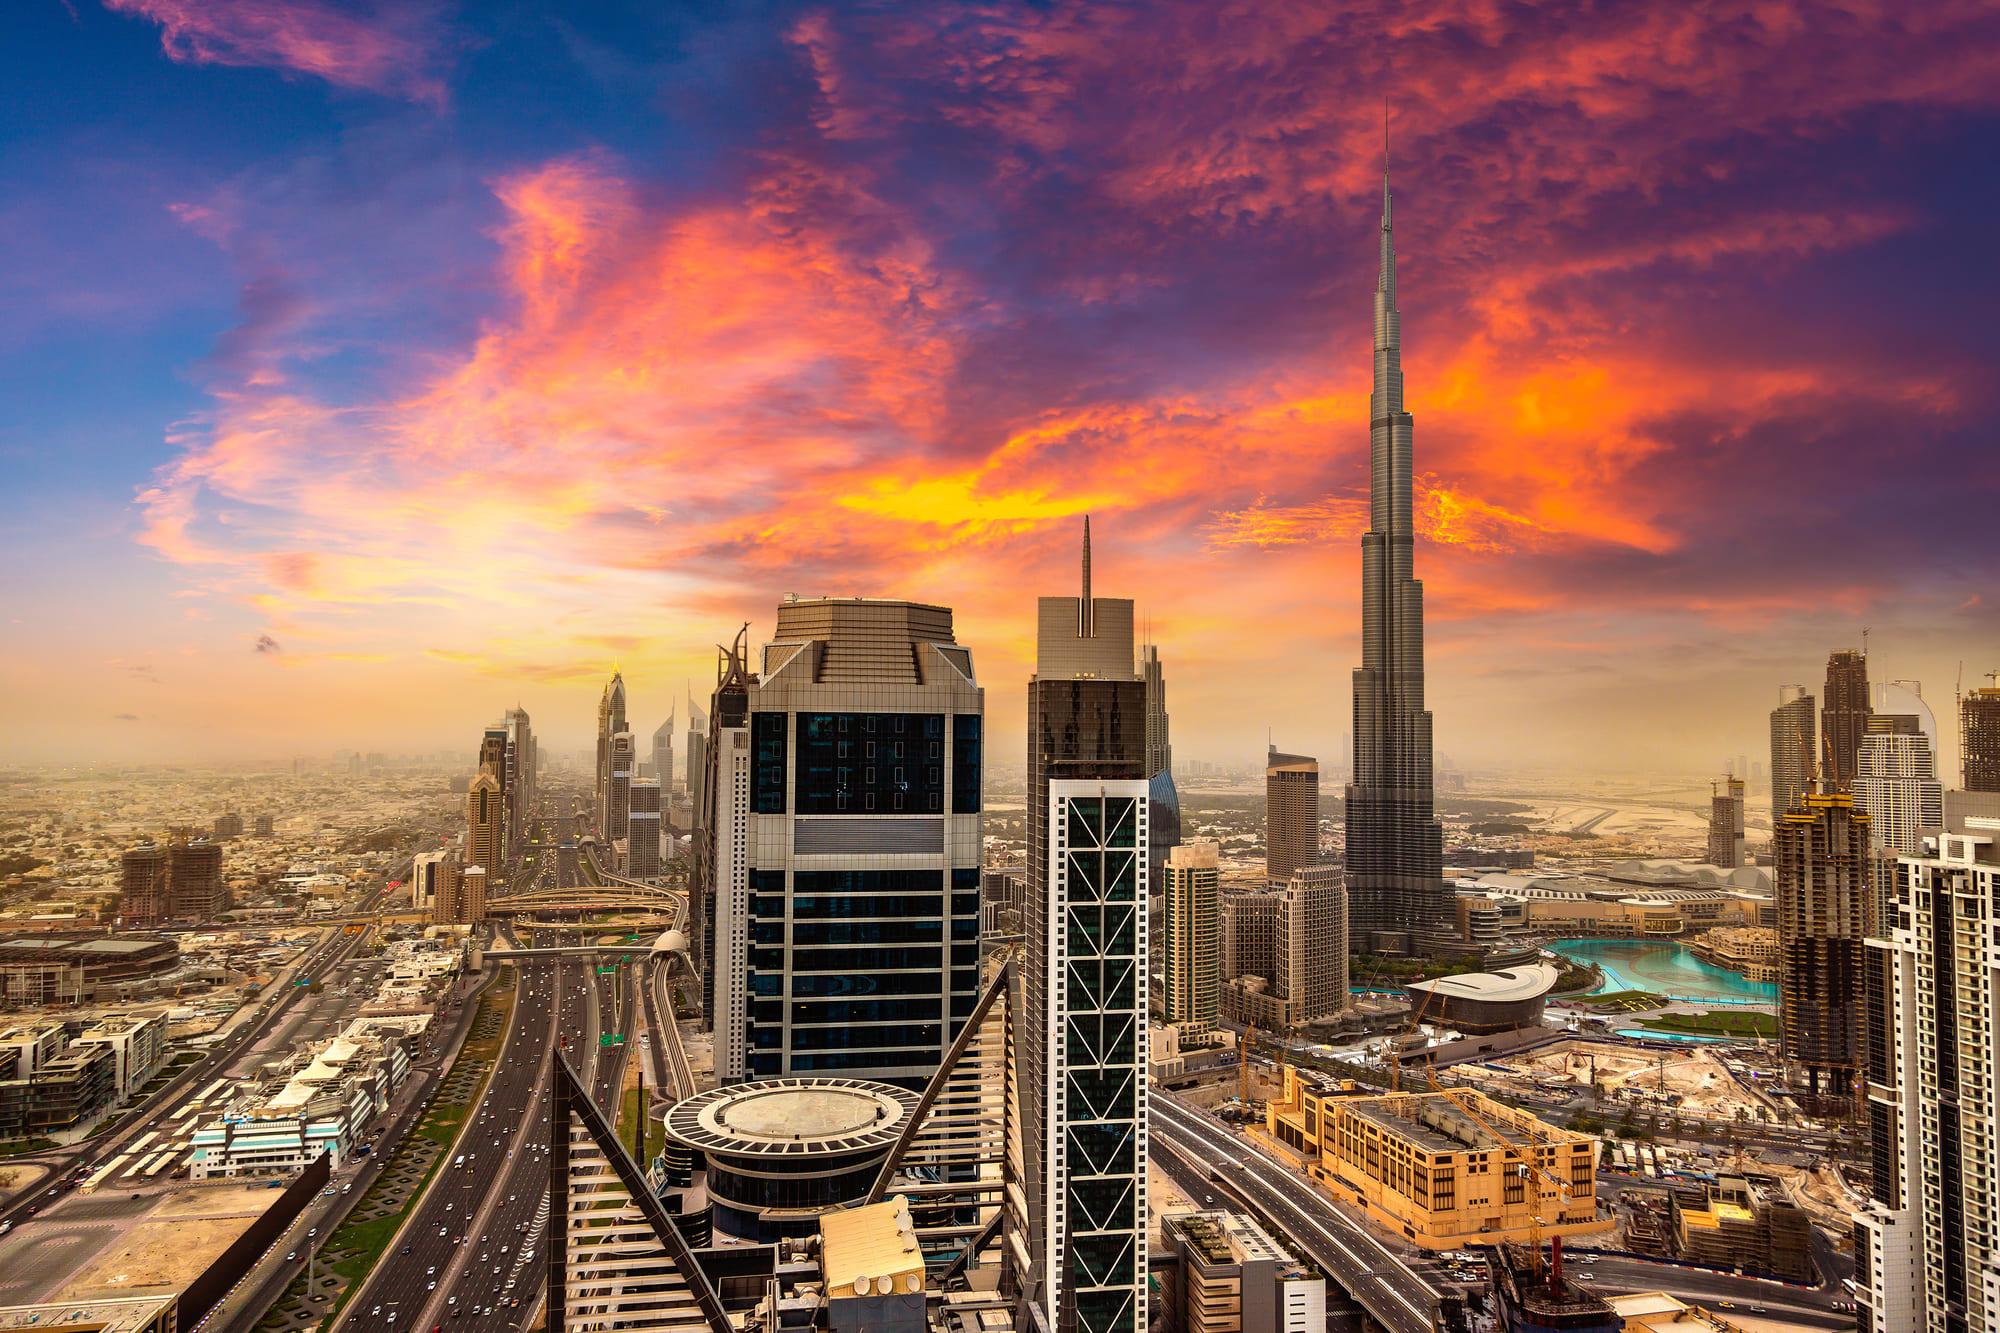 The Burj Khalifa Tower